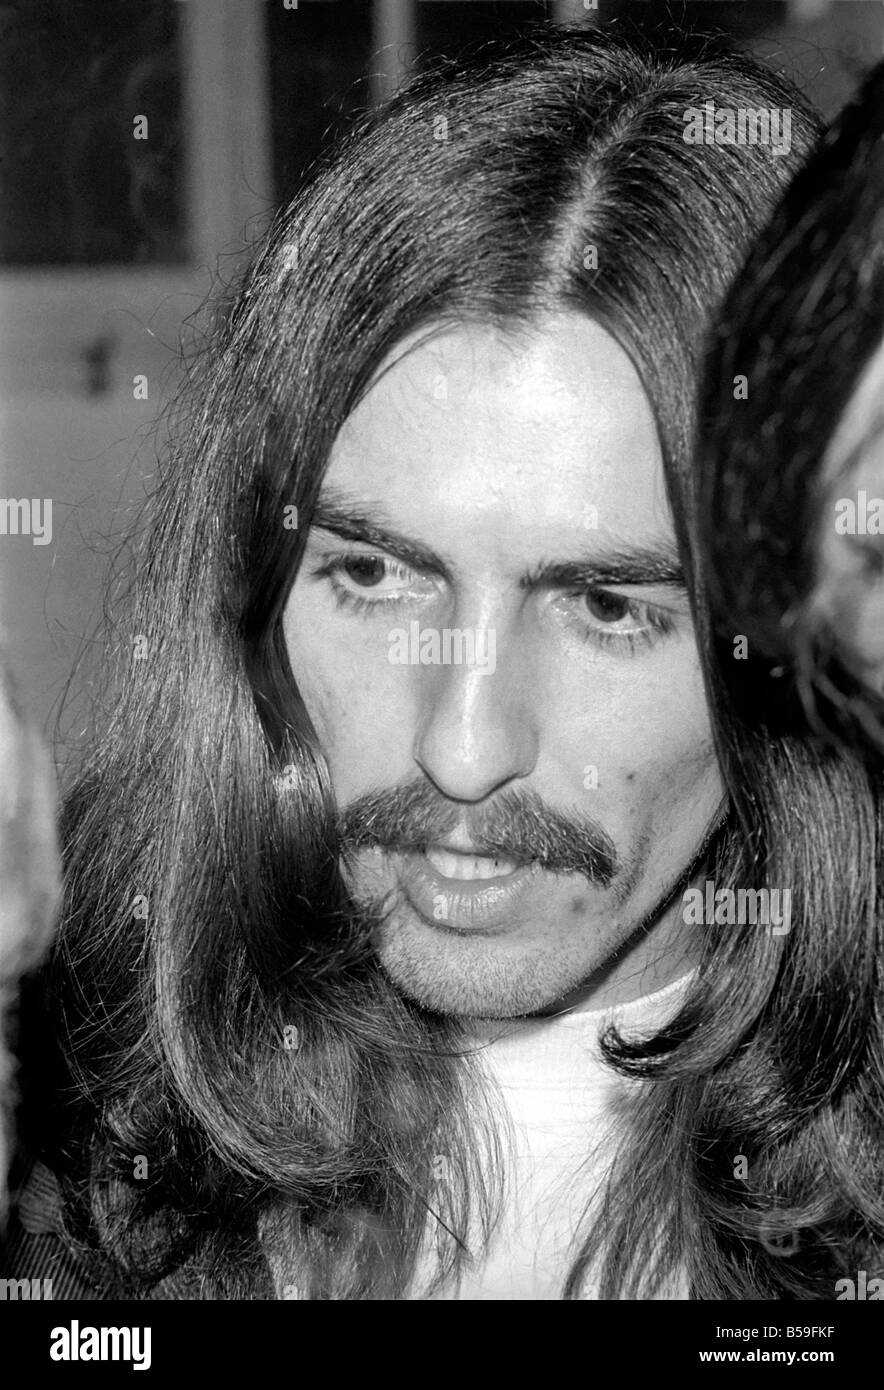 Beatles singer George Harrison. December 1969 Z11673-007 - Stock Image